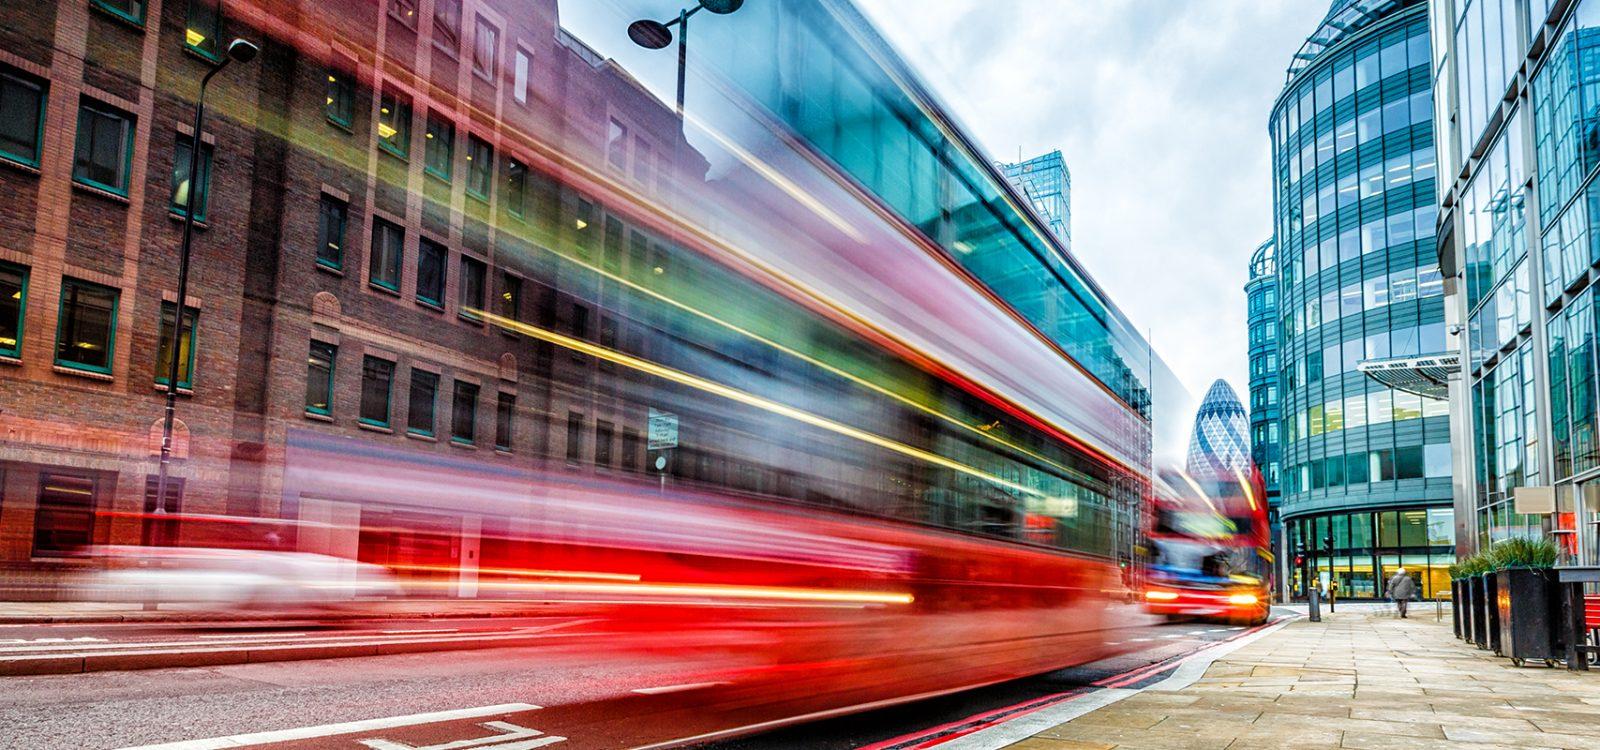 London double-decker bus at Bishopsgate